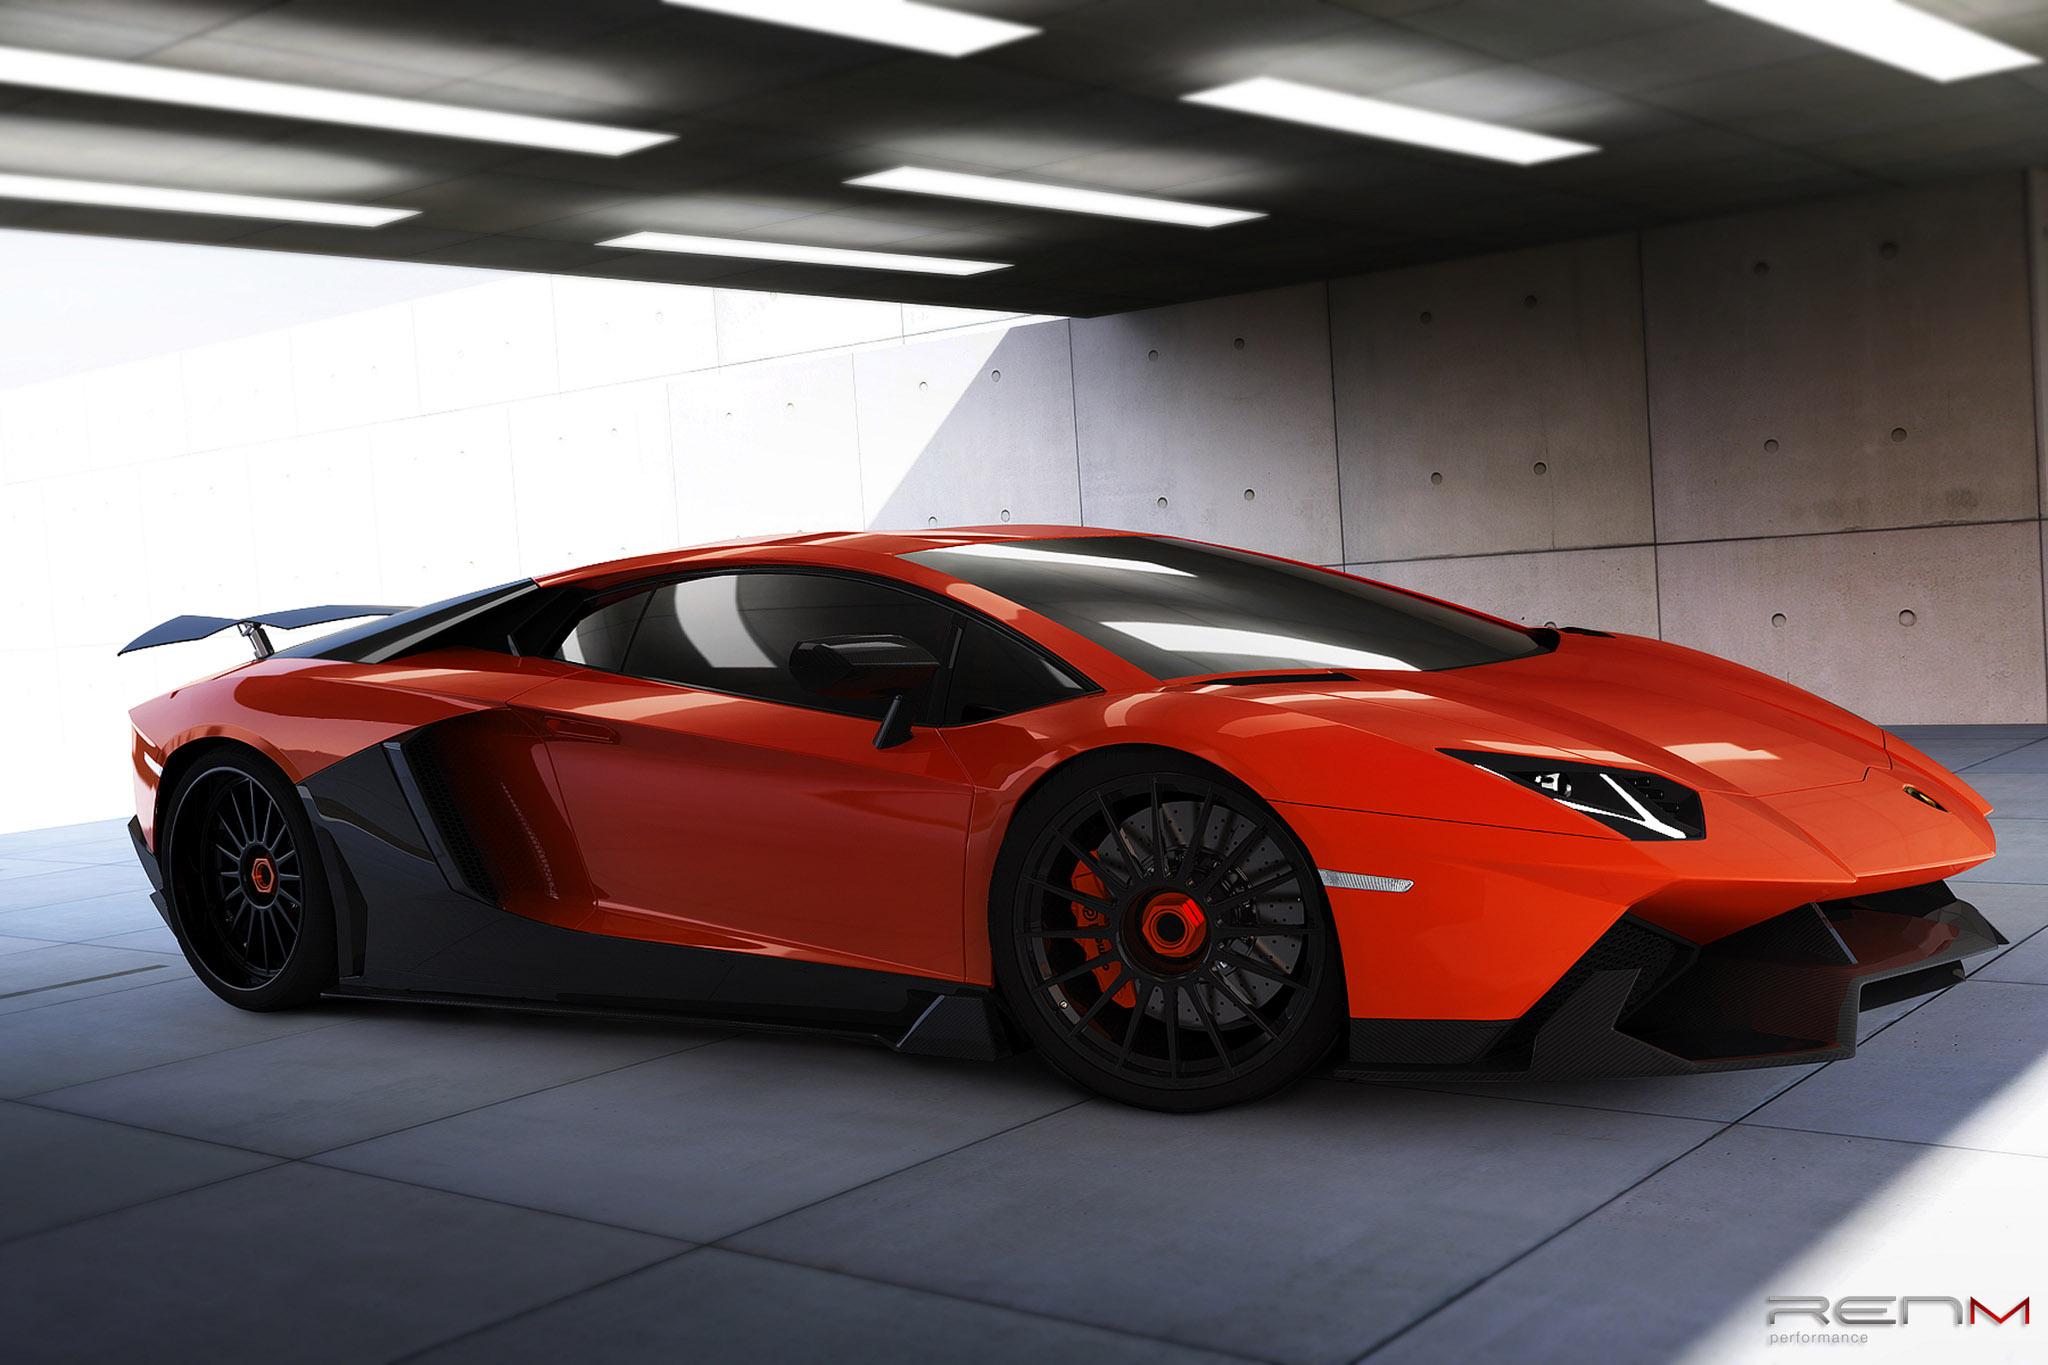 Renm Performance Lamborghini Aventador Le C Supercars